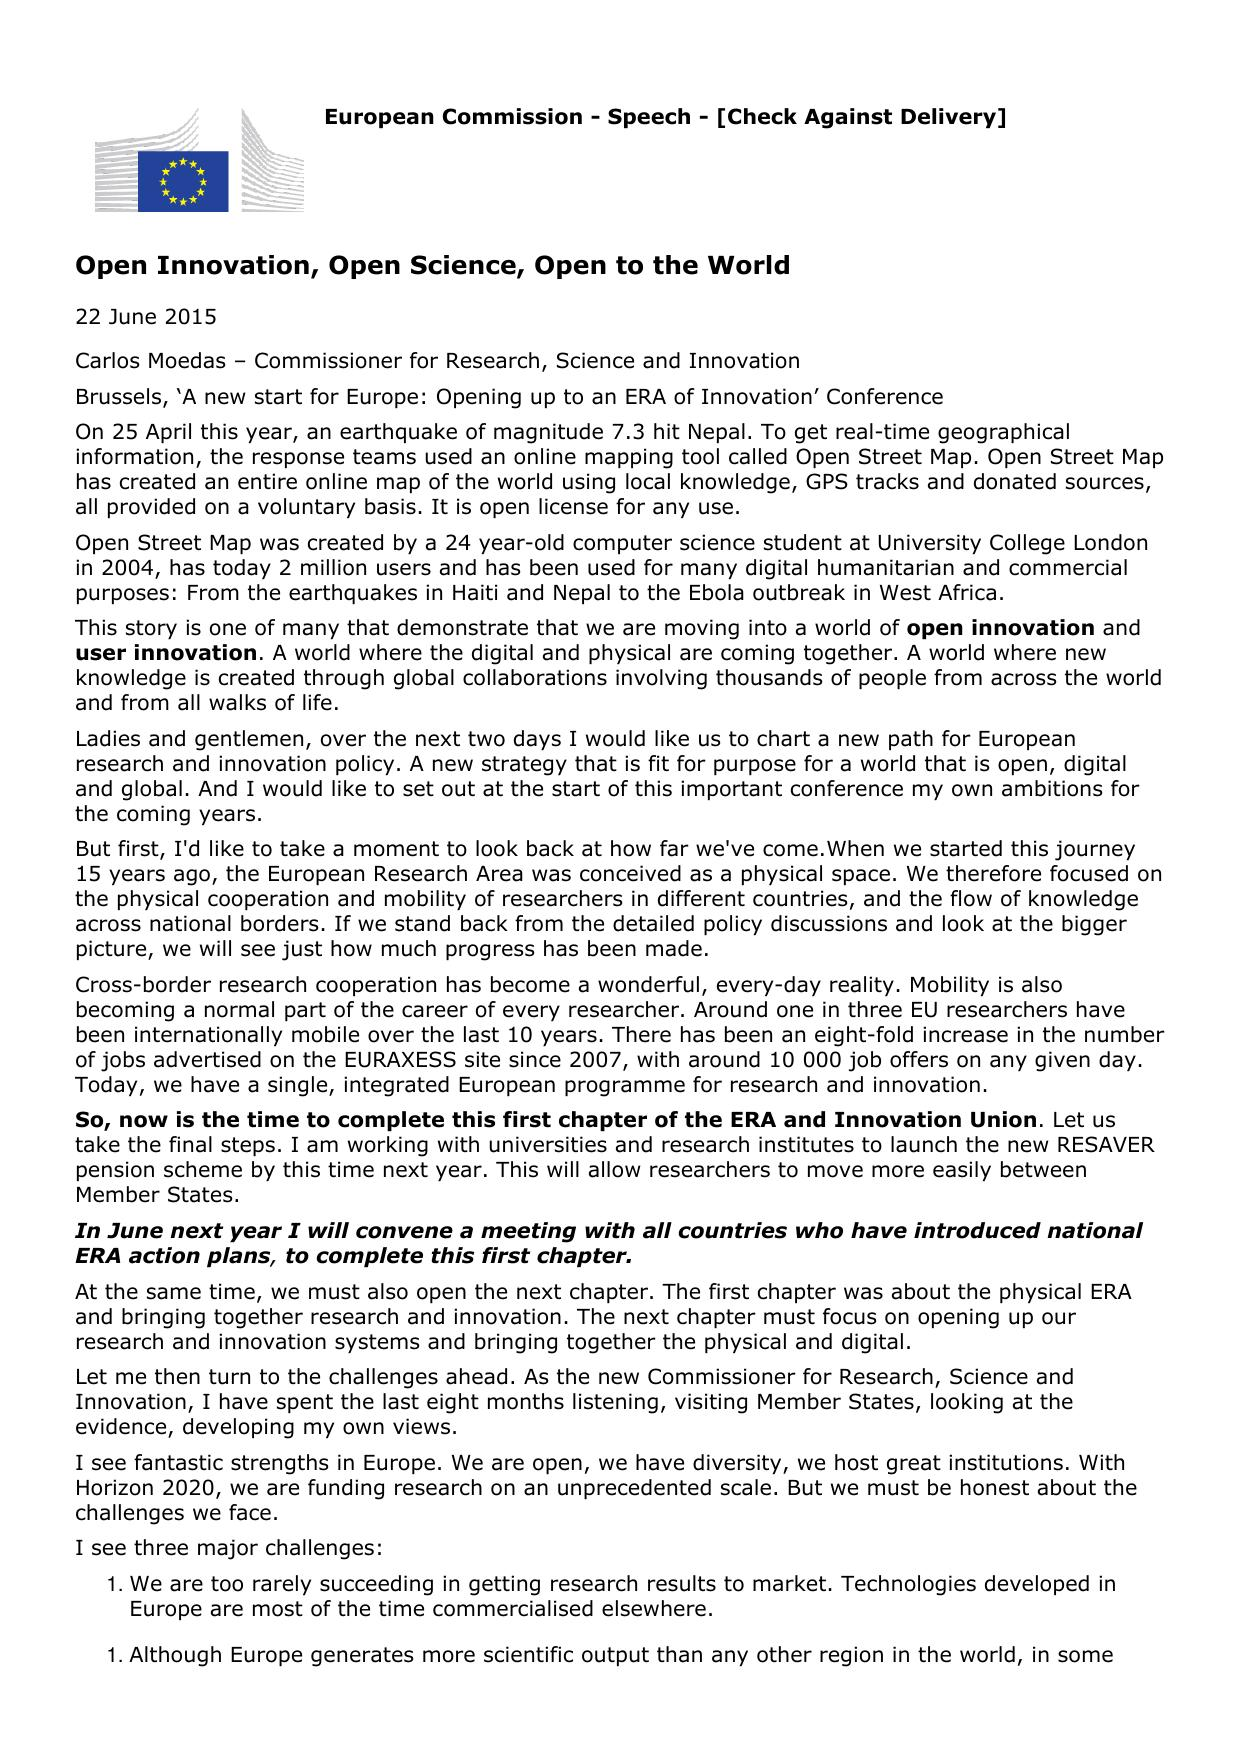 SPEECH 15-5243, Carlos Moedas; Open Innovation, Open Science, Open to the World, 22 June 2015